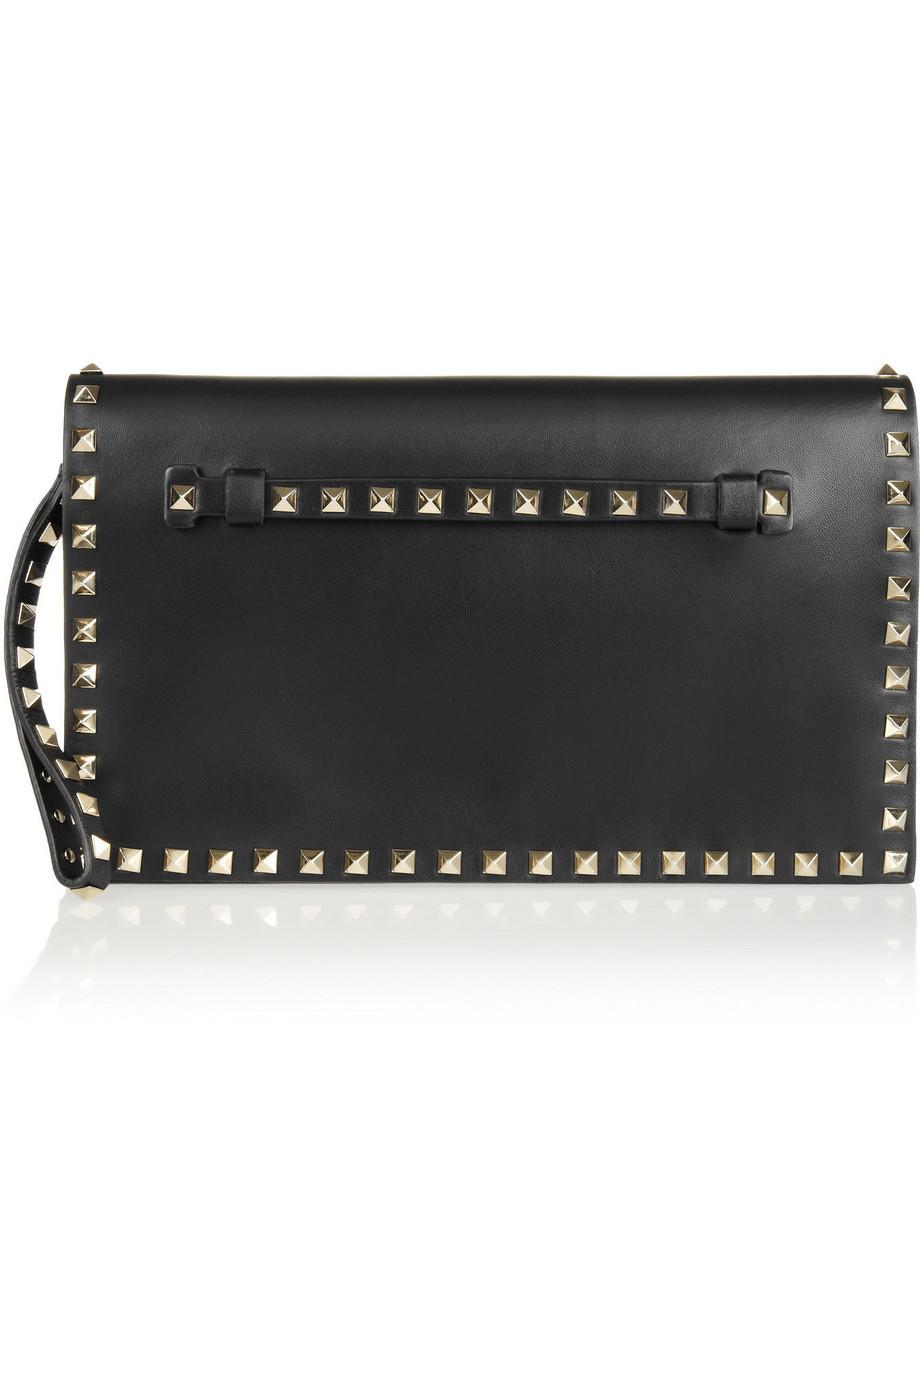 Valentino The Rockstud Leather Clutch, Black, Women's